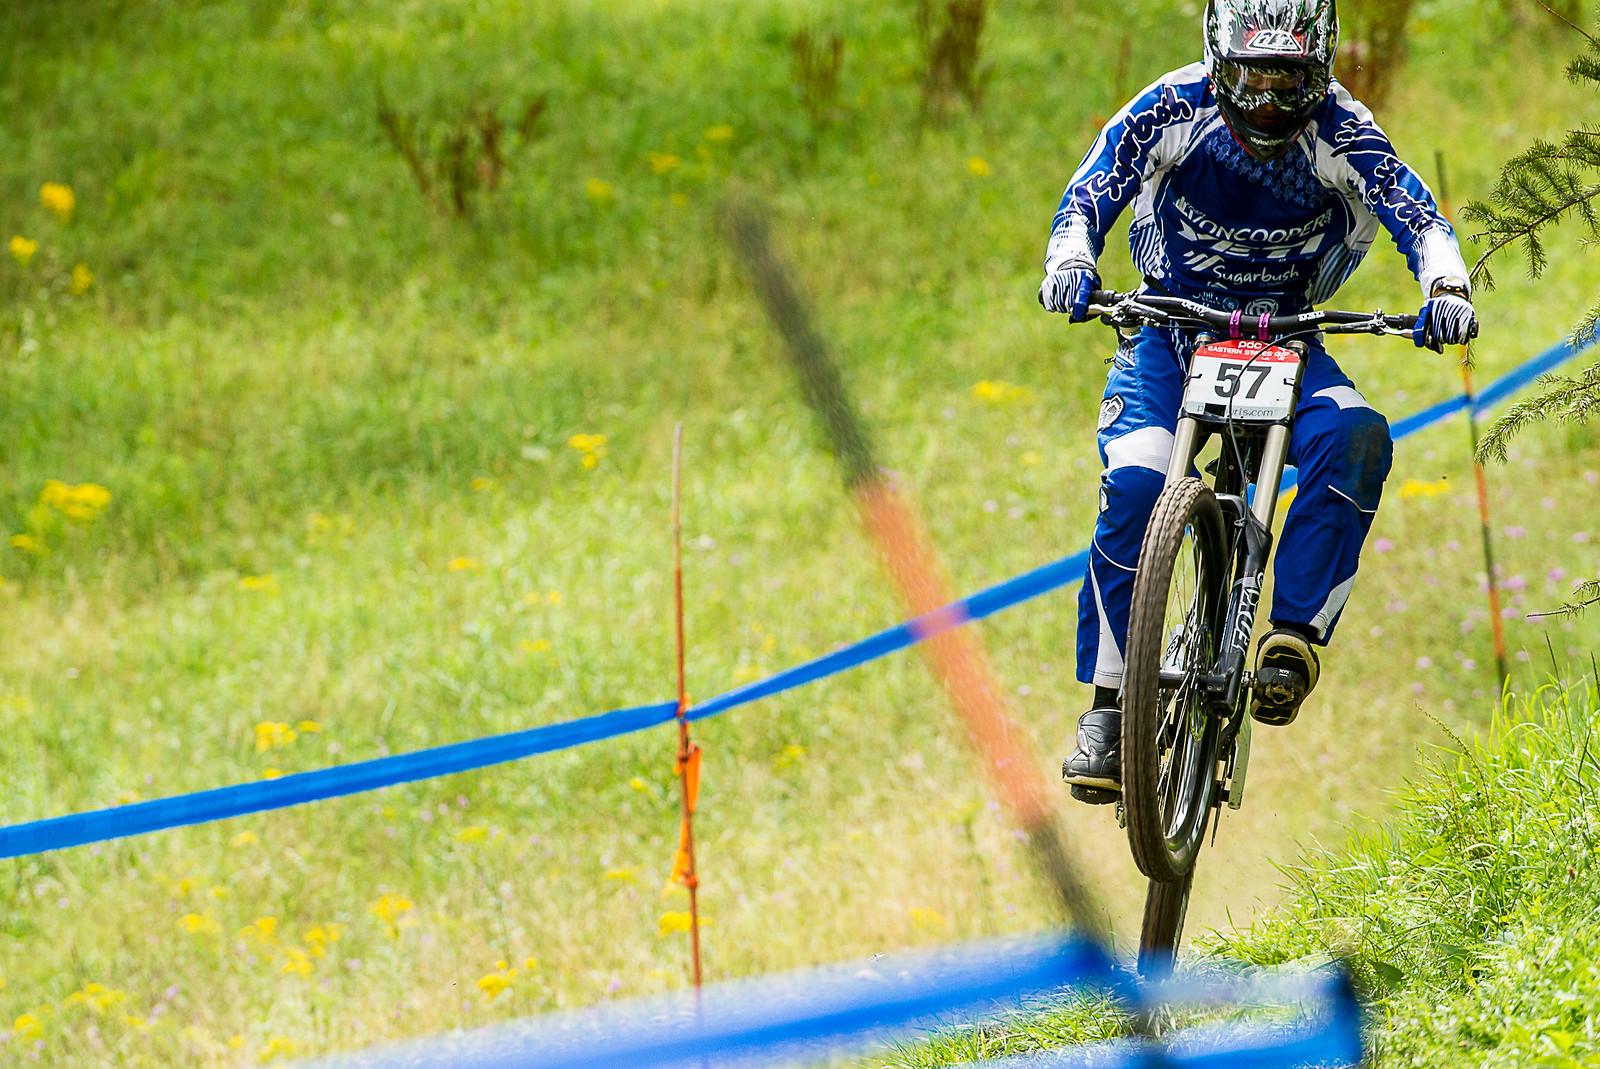 Gavin Vaughn at the Plattekill ESC - mdelorme - Mountain Biking Pictures - Vital MTB